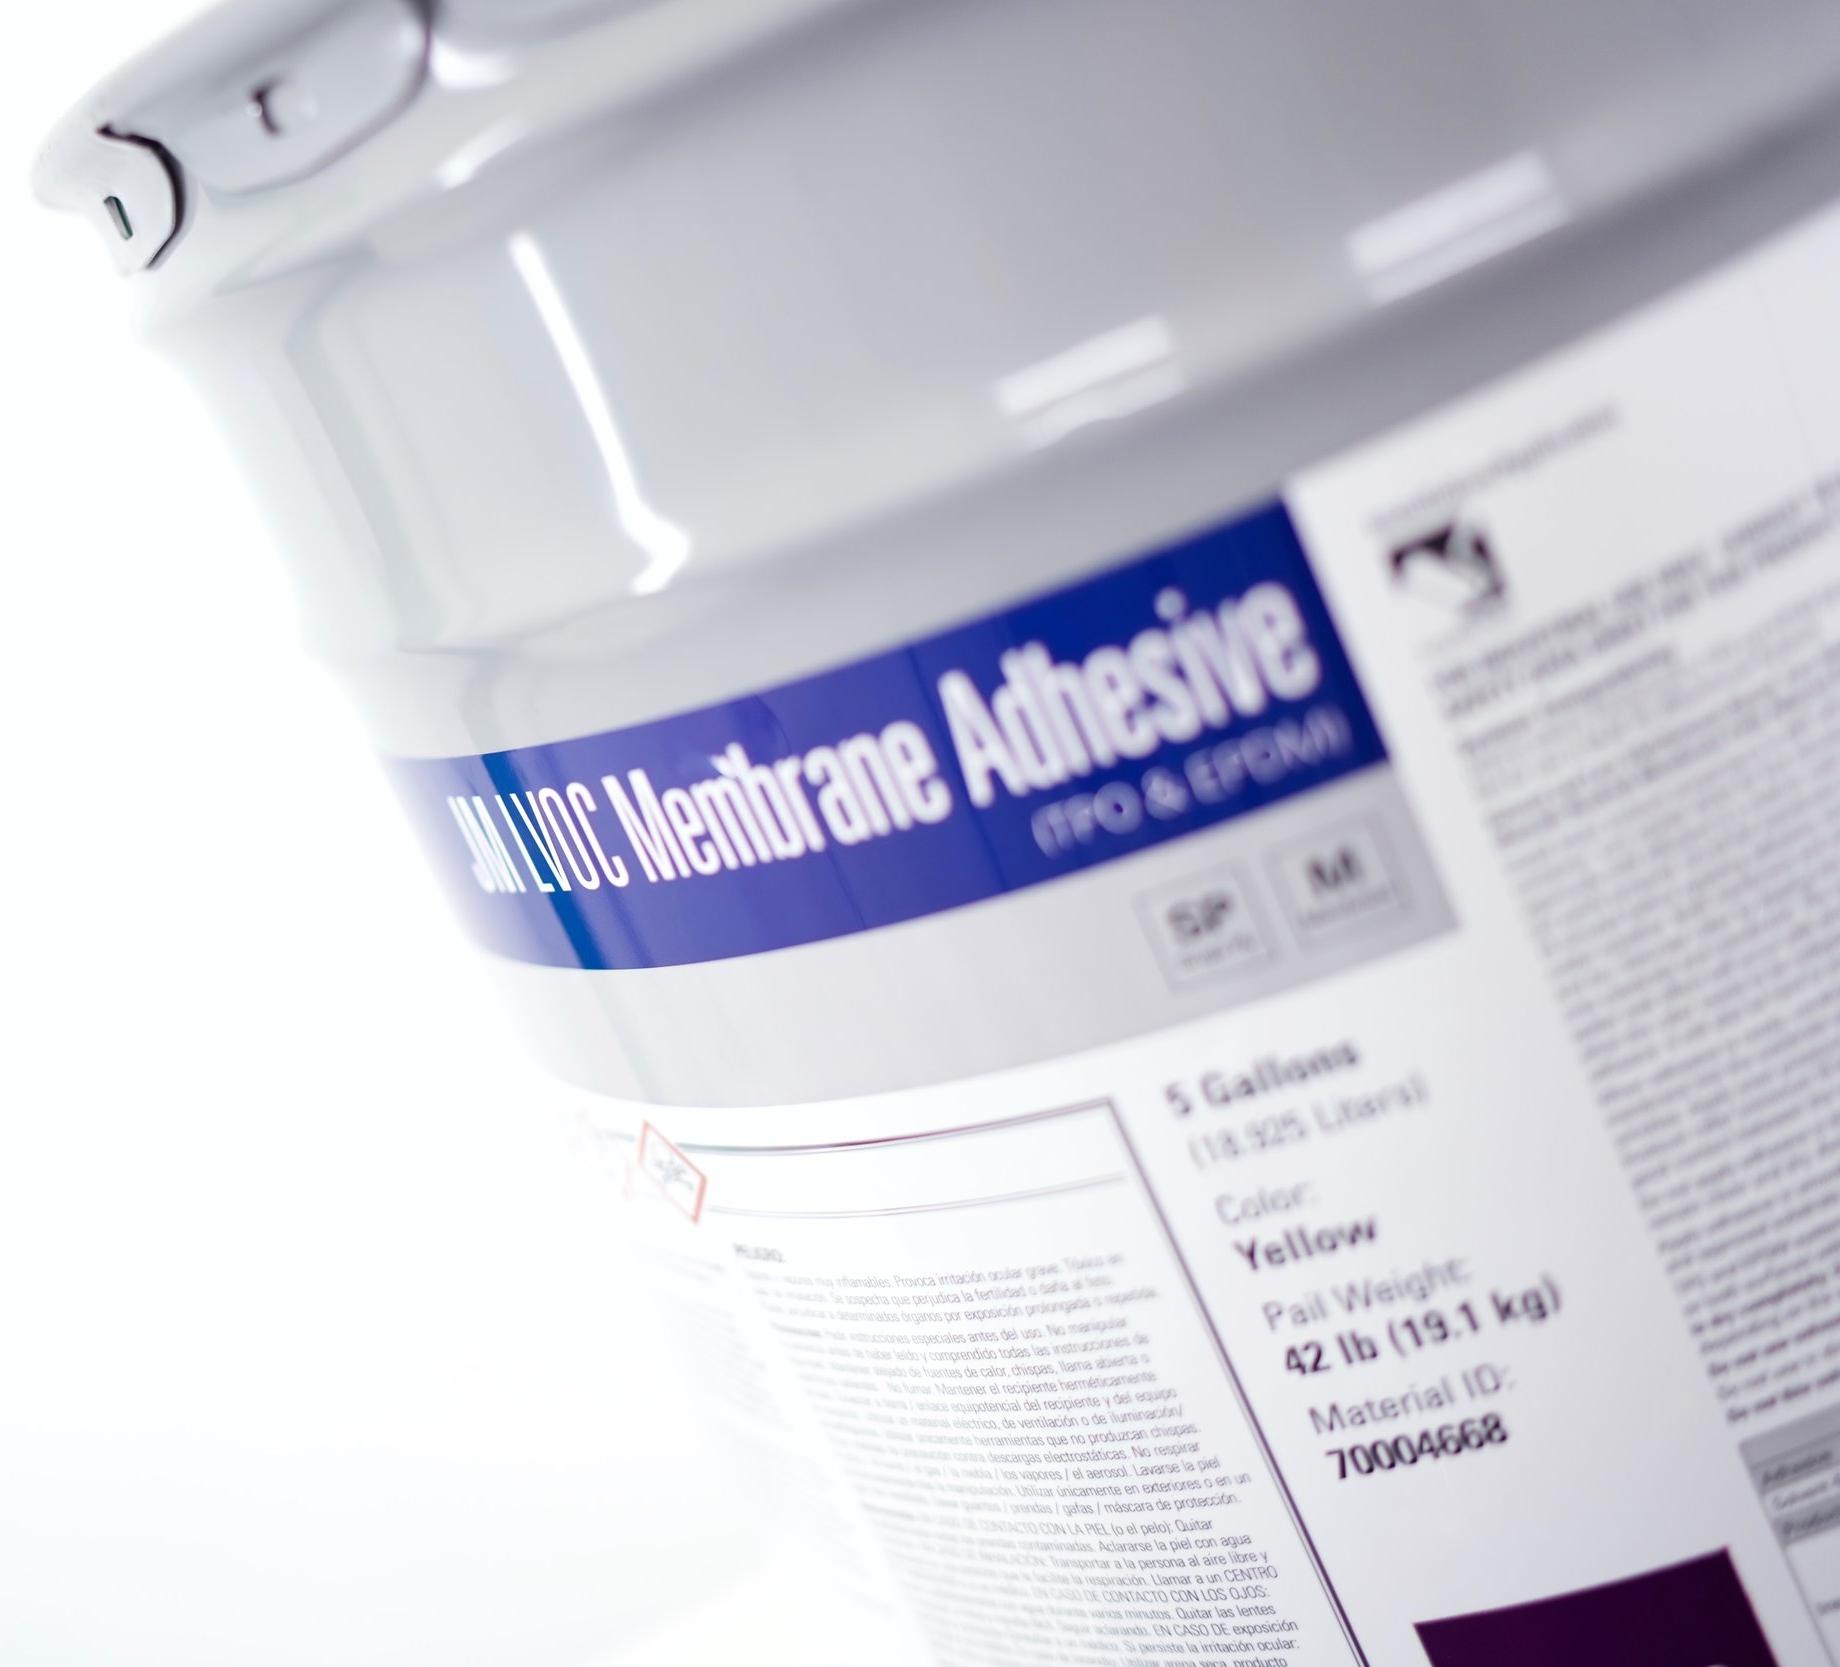 JM Membrane adhesive LVOC (TPO & EPDM) 1